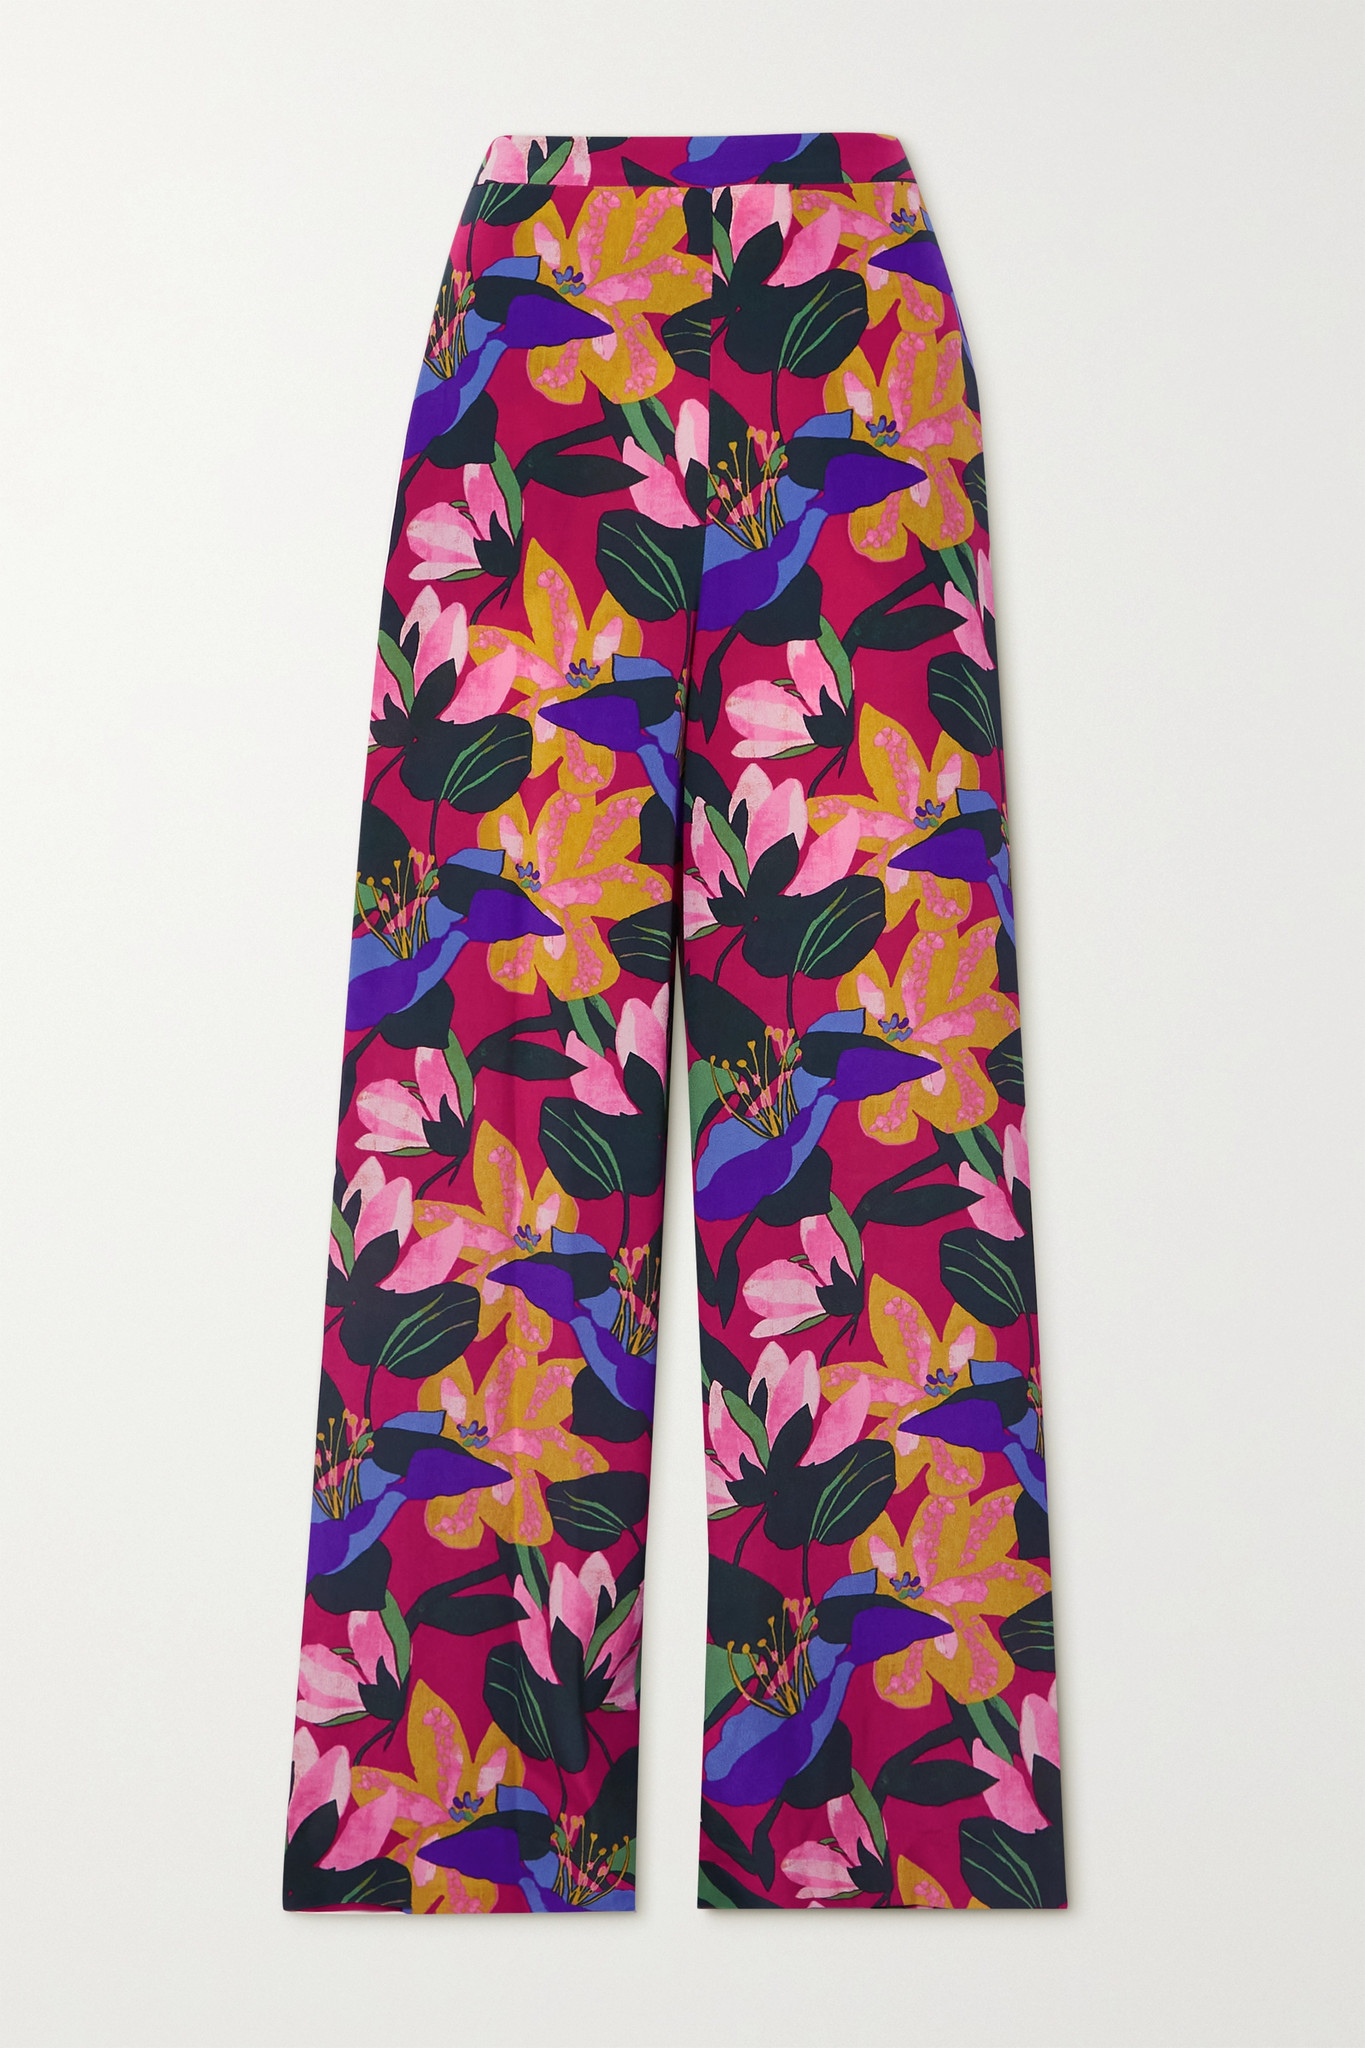 DIANE VON FURSTENBERG - Pauline Floral-print Silk Crepe De Chine Wide-leg Pants - Pink - US4